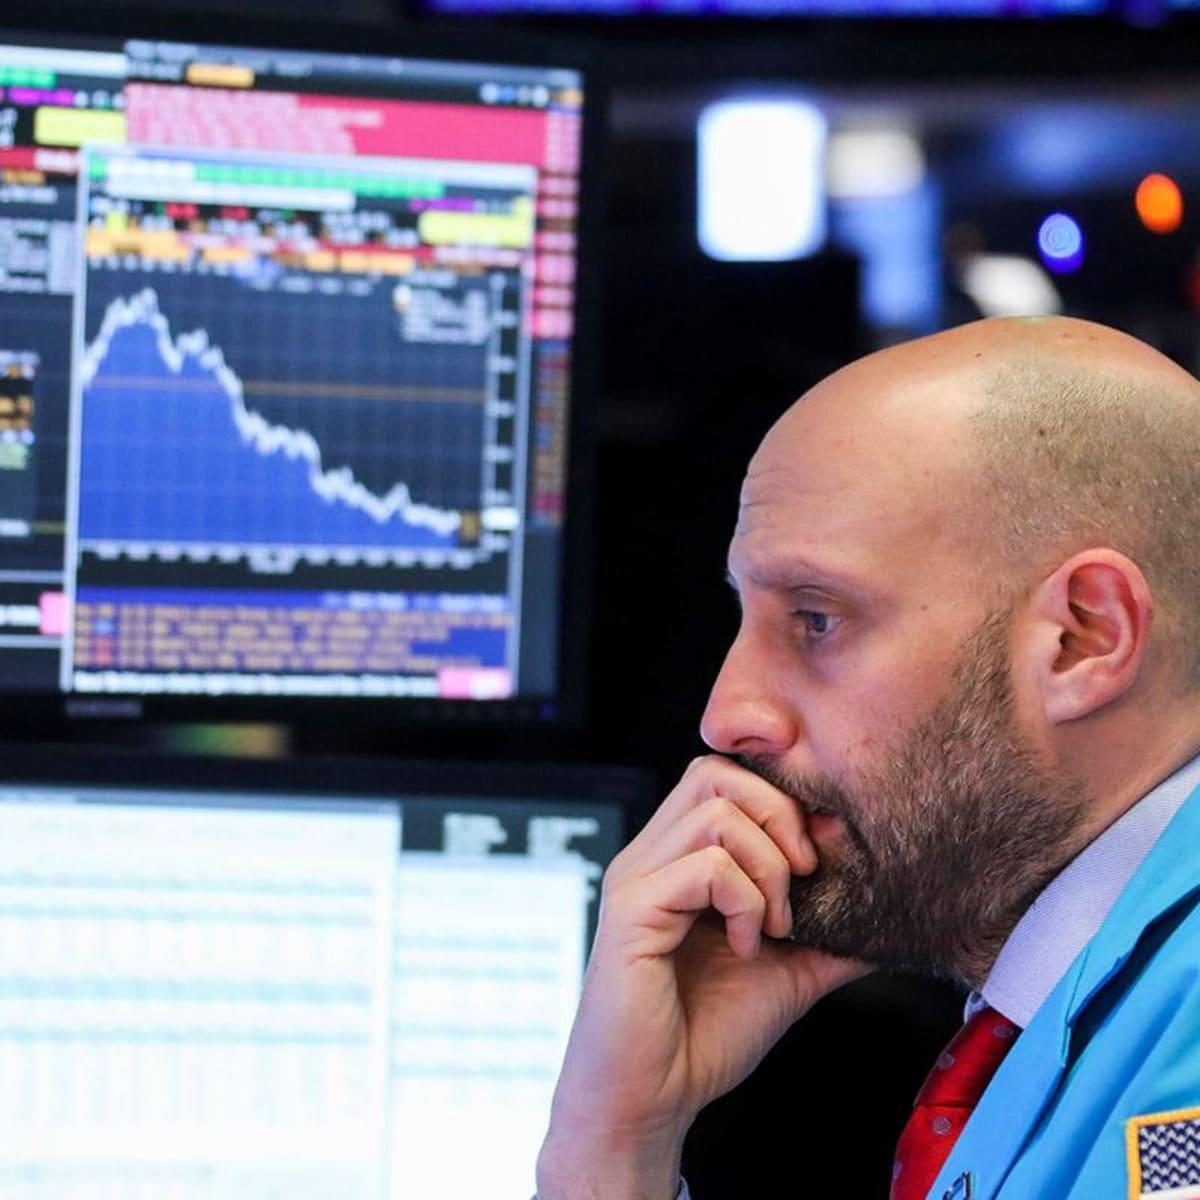 Global stocks move higher in 2017